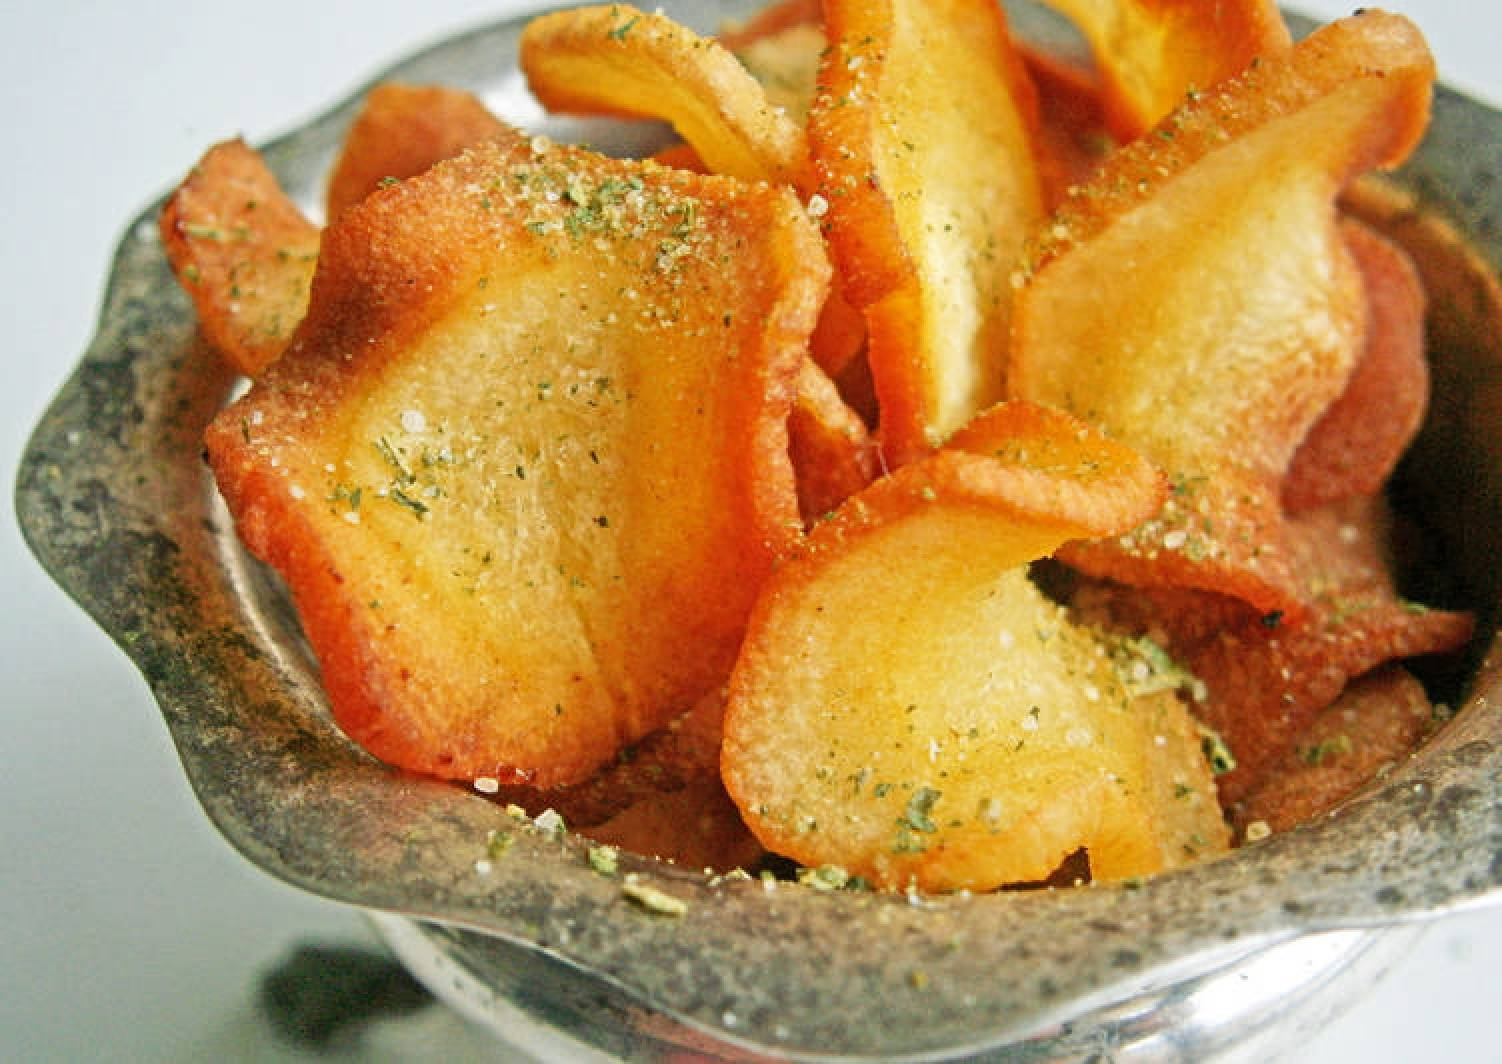 Coriander-salt parsnip crisps